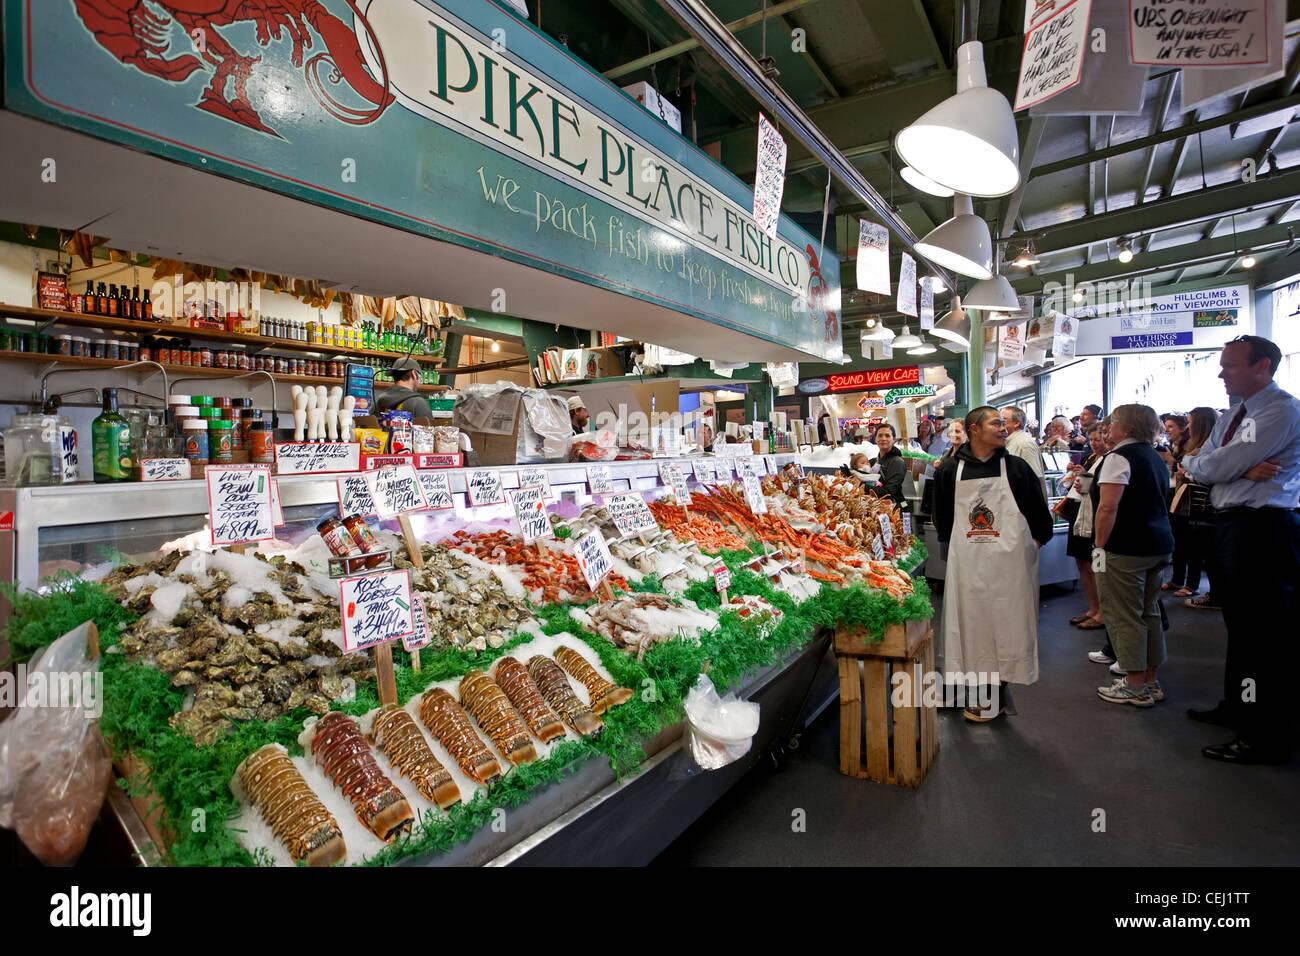 Fish Markets In West Island